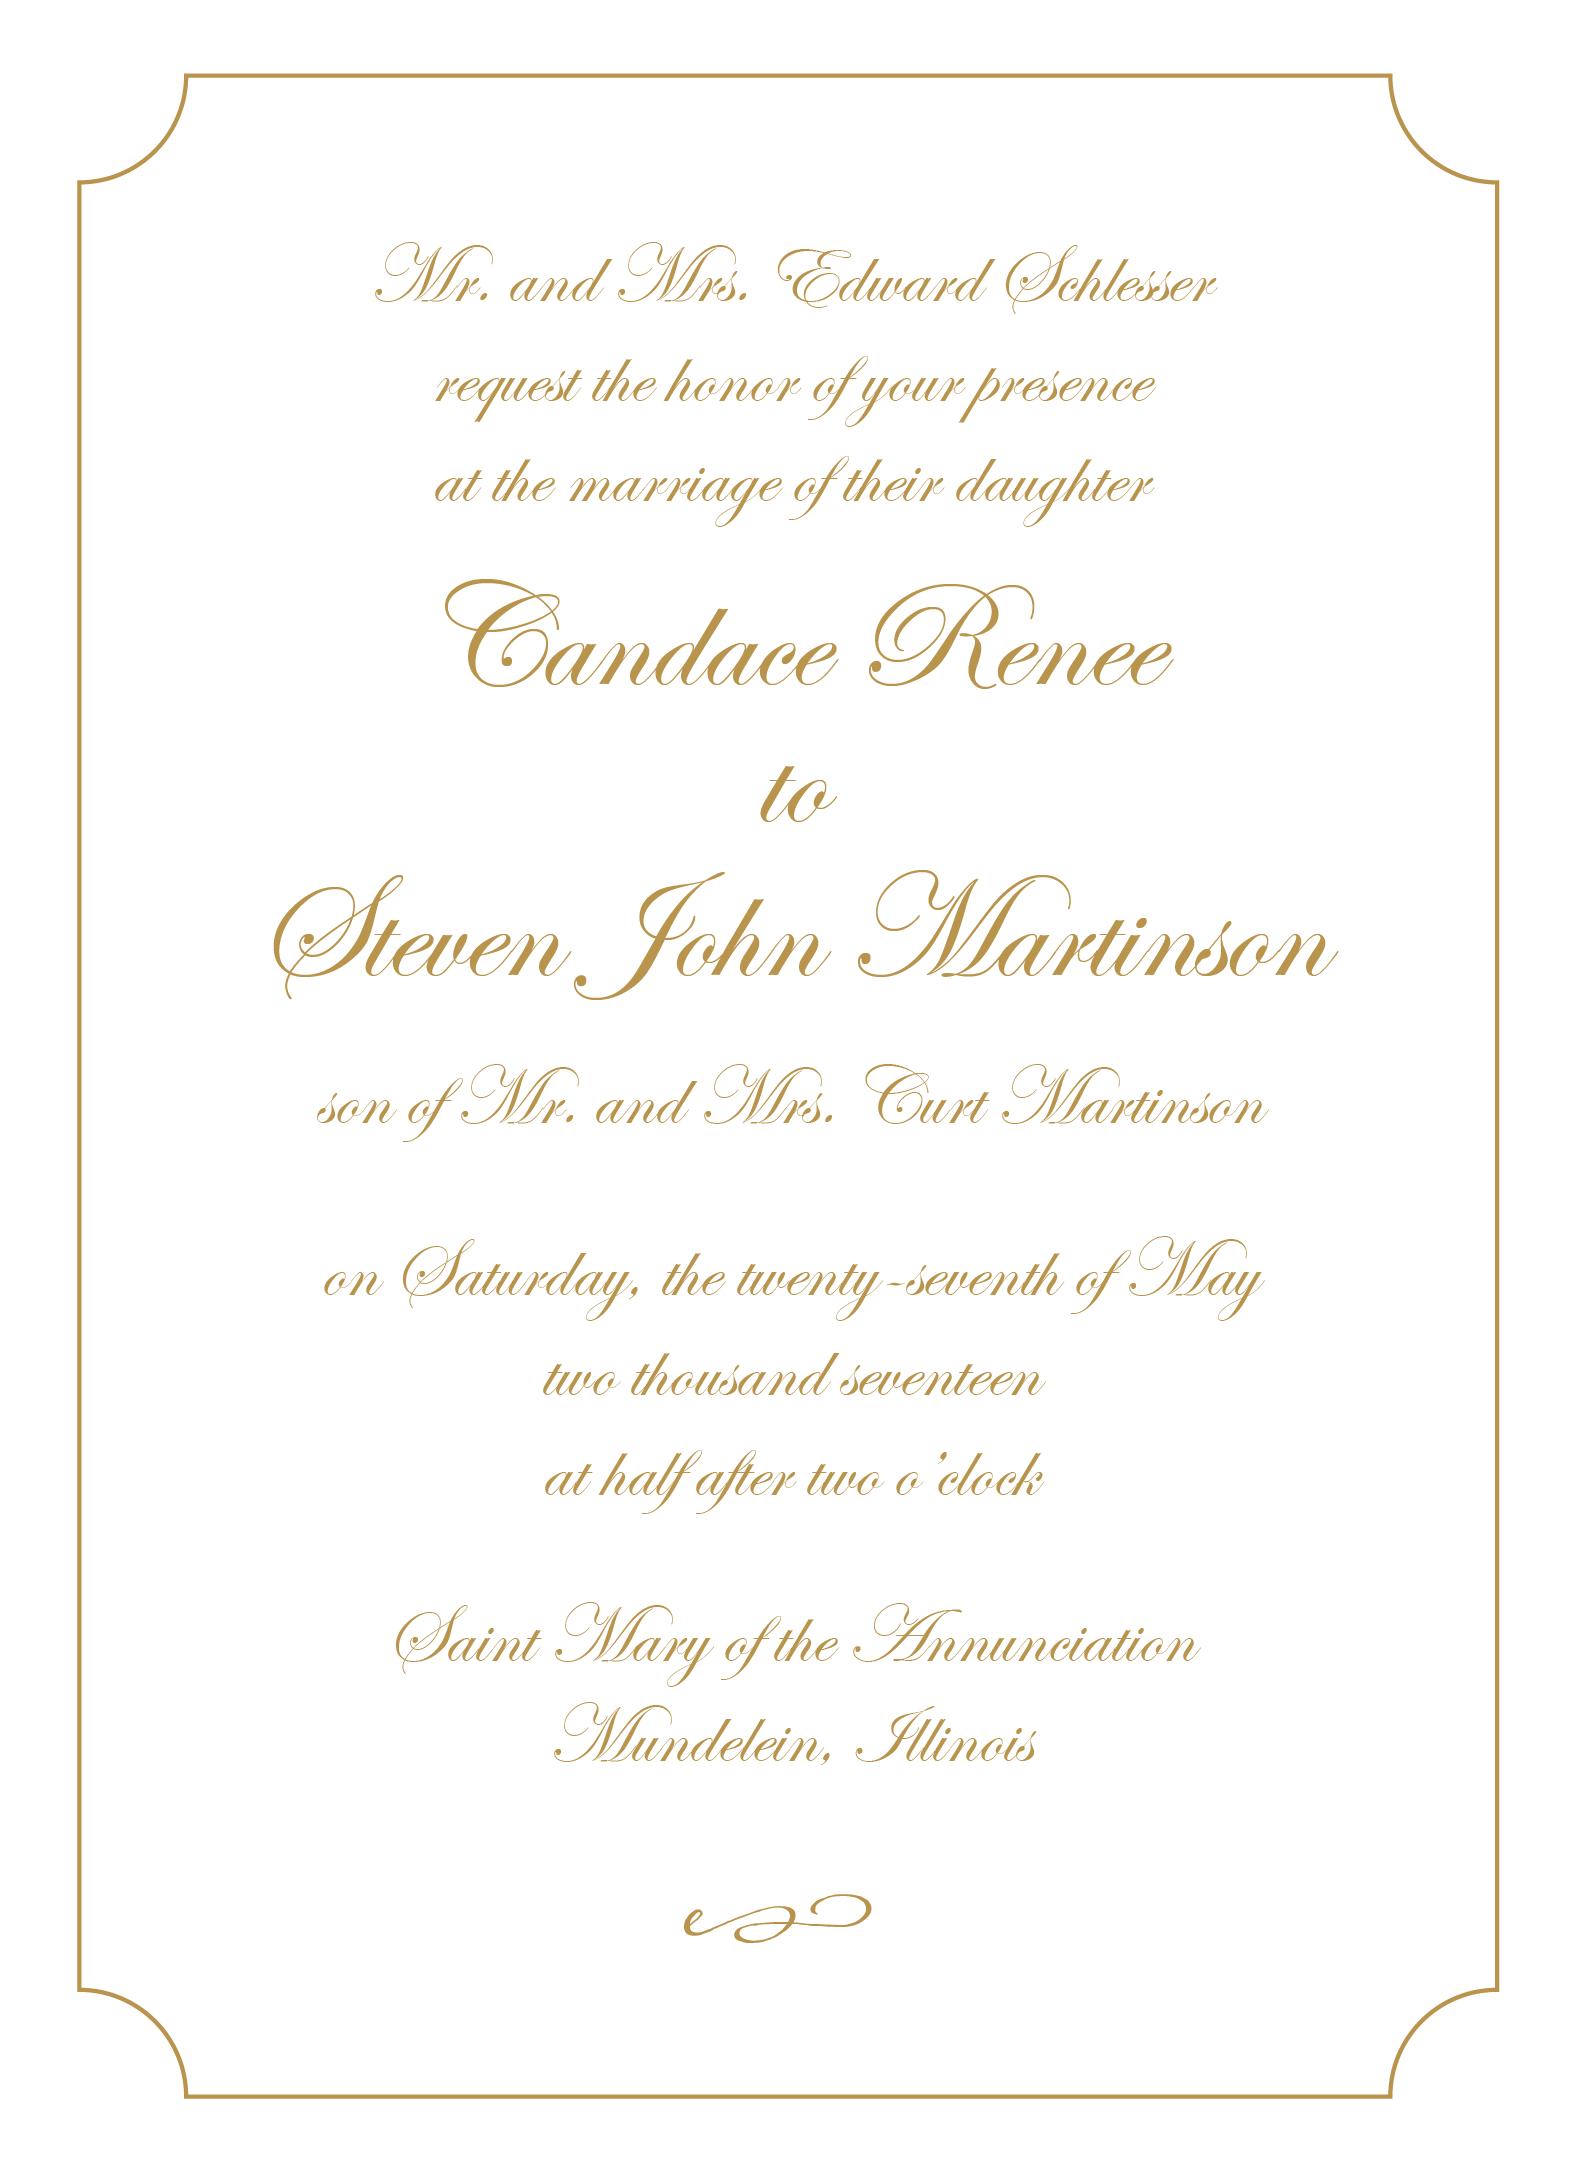 Candace_Invitation copy.png